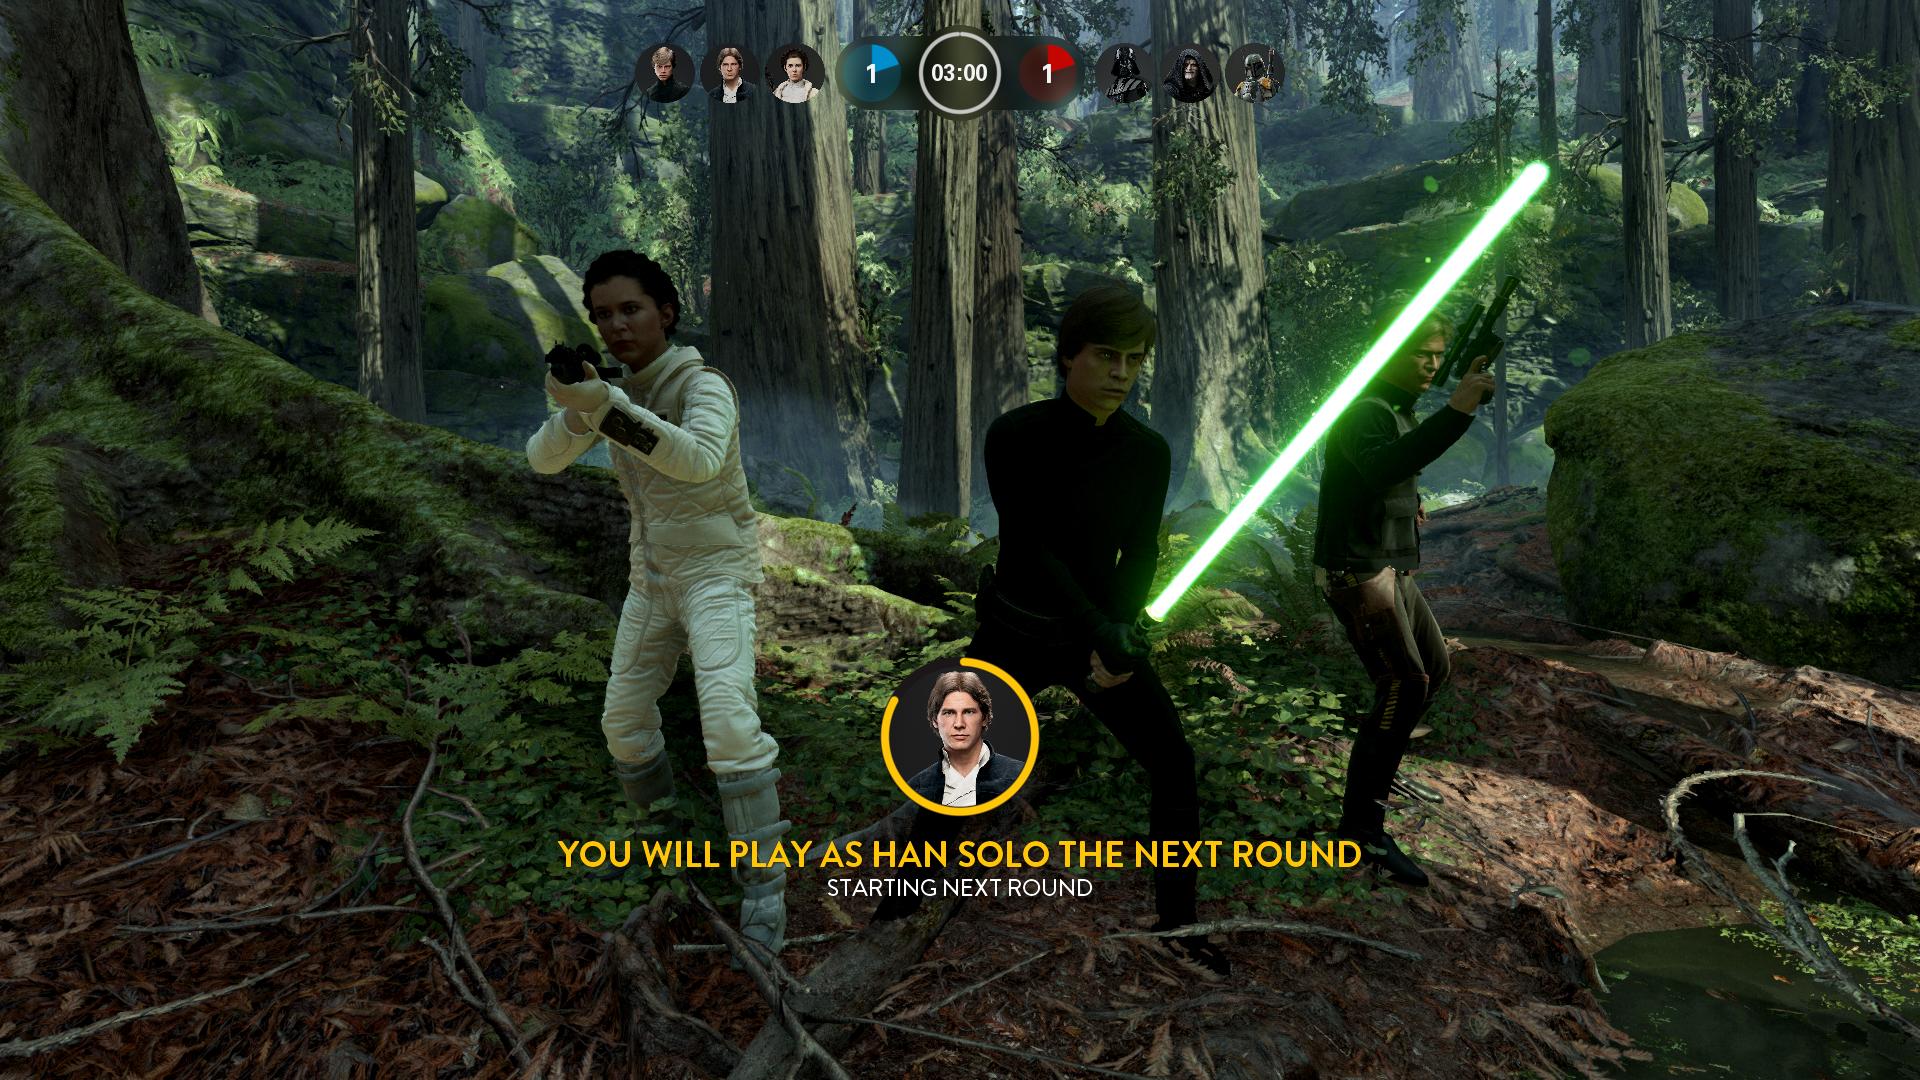 Star Wars Battlefront review | PC Gamer